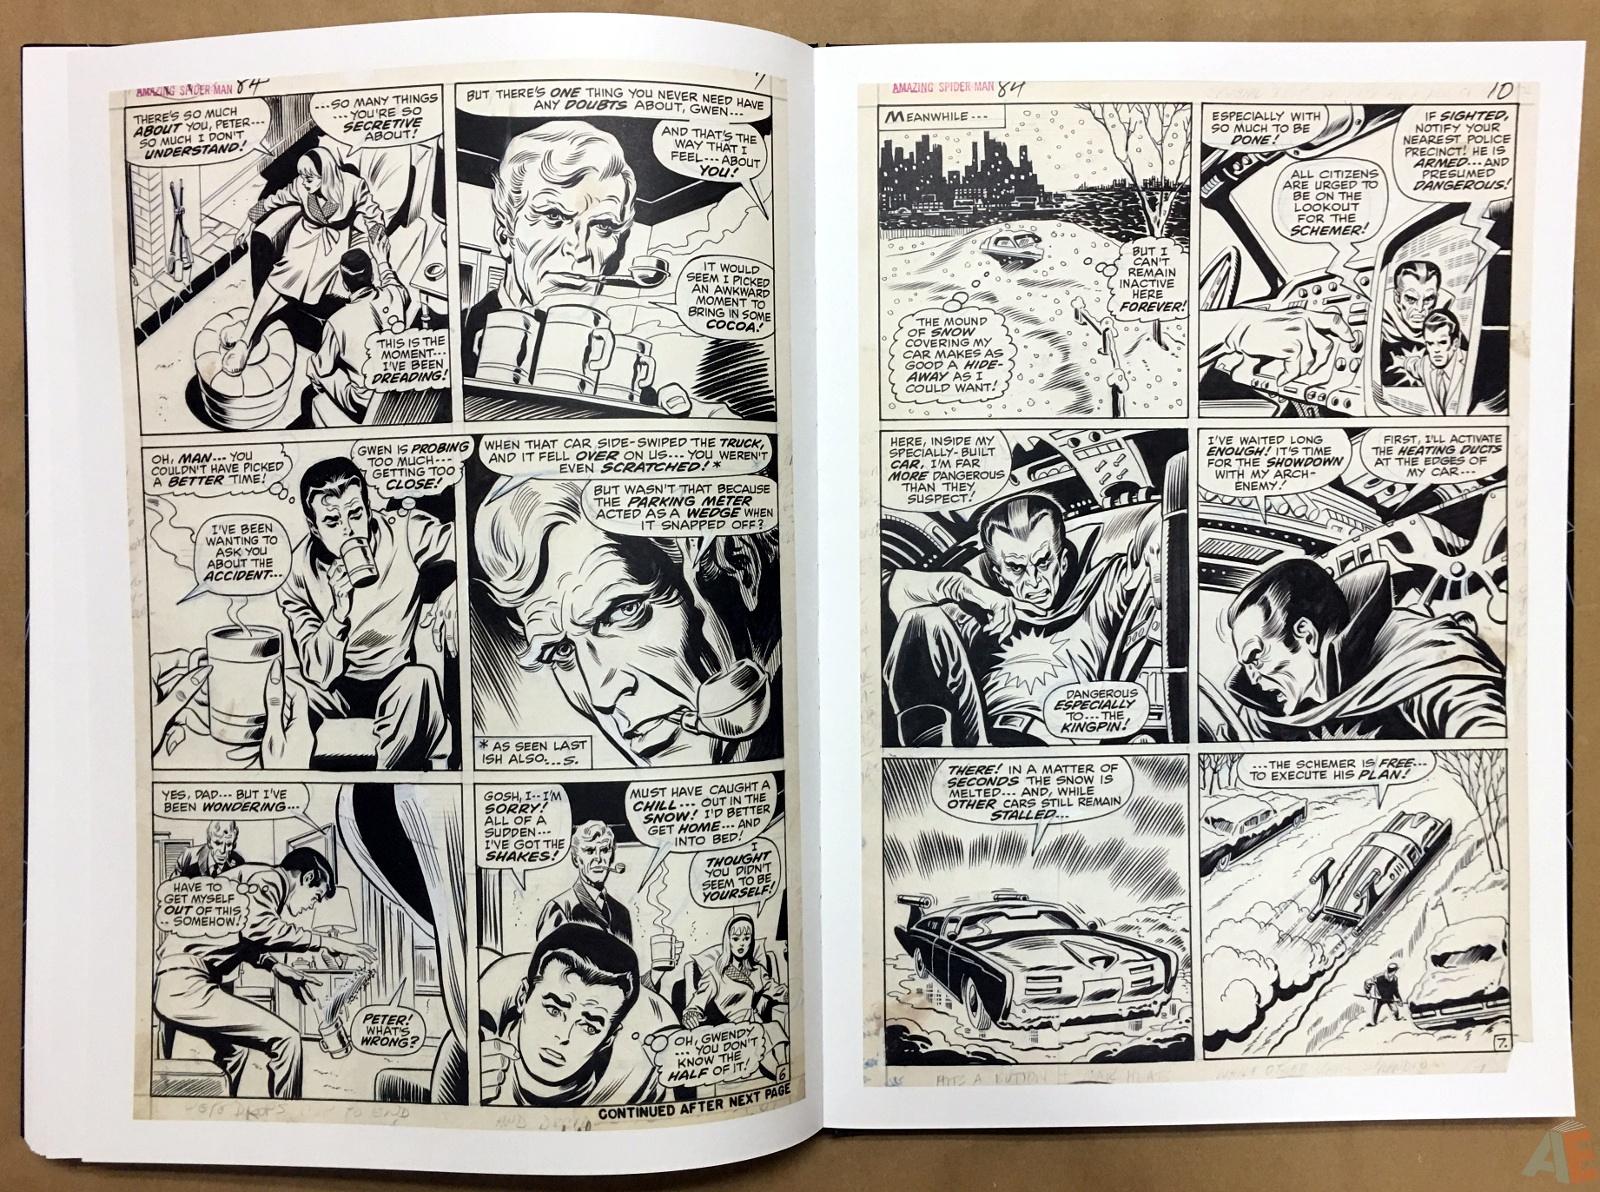 John Romita's The Amazing Spider-Man Artist's Edition 46